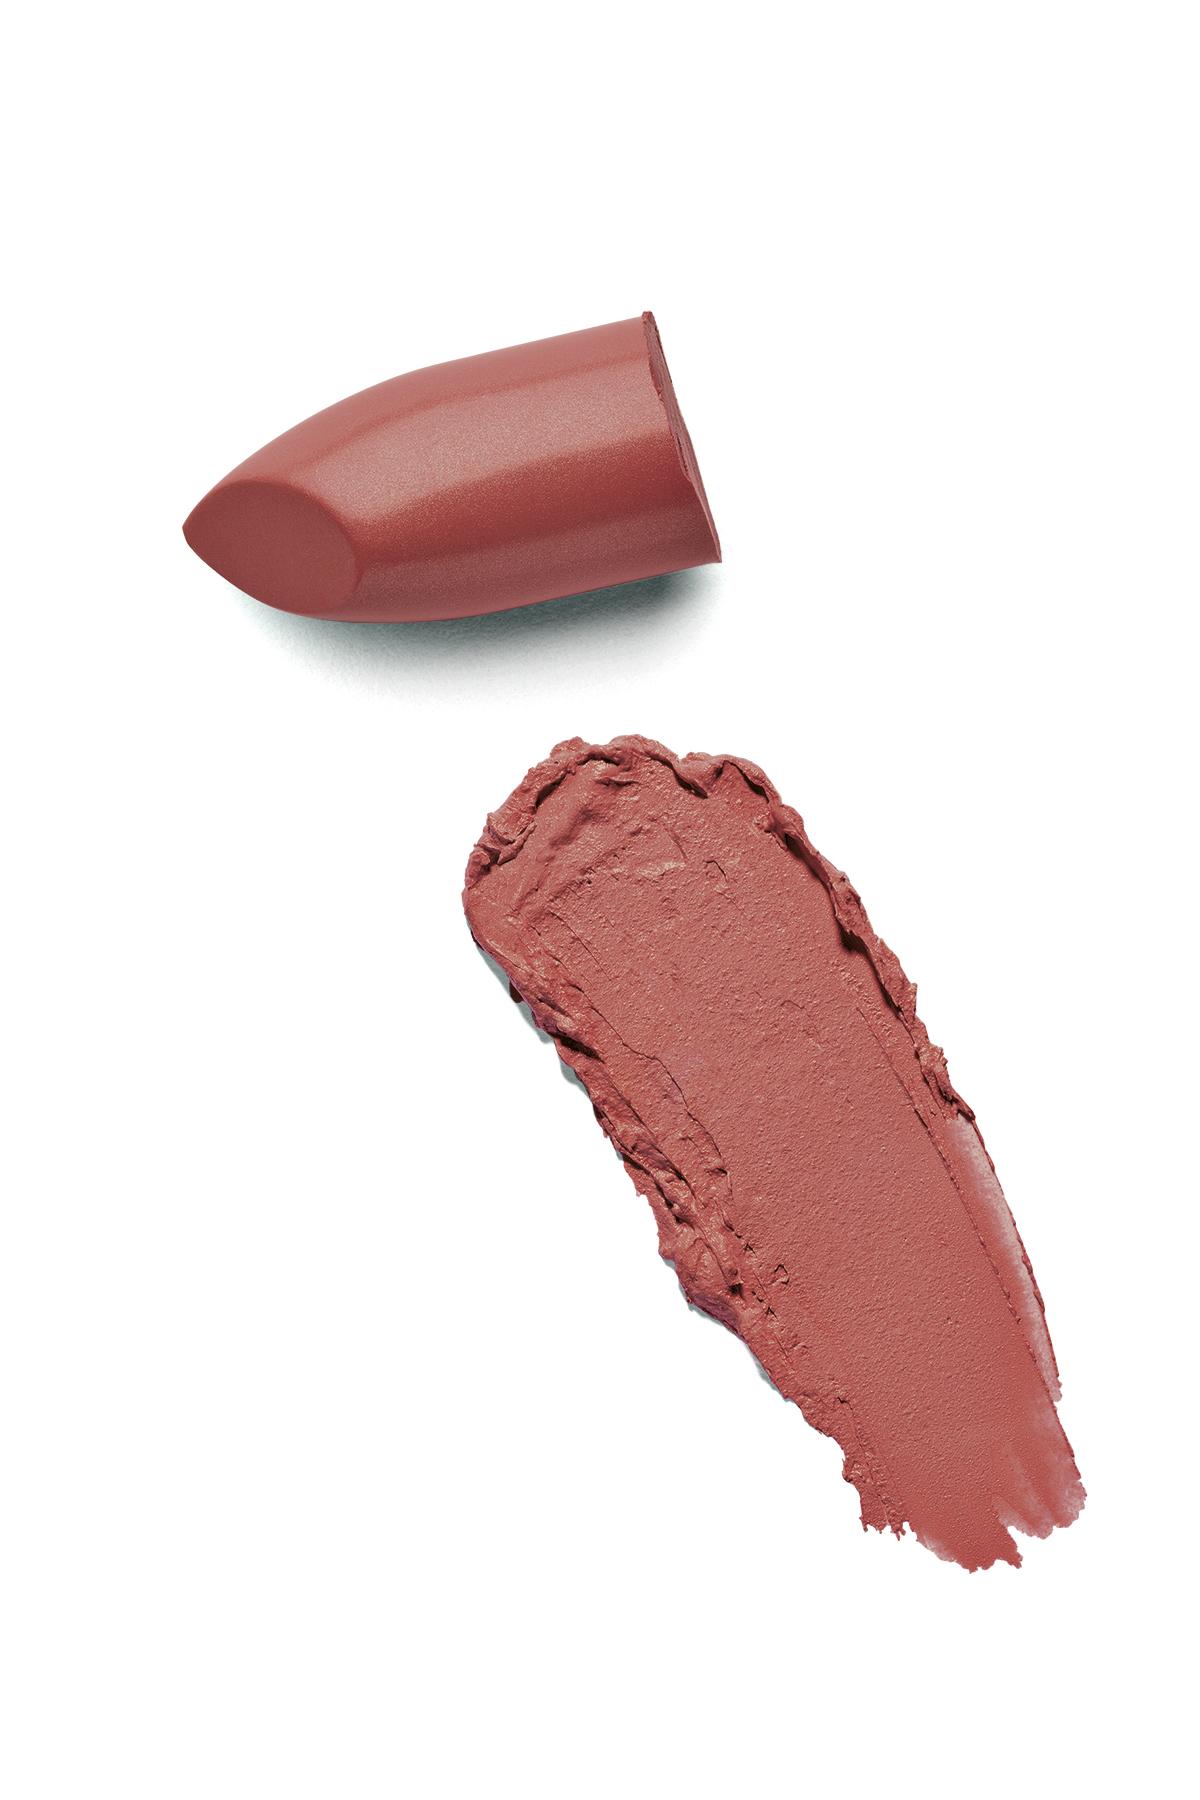 Matte Lipstick - 182 -Lipstick Thumbnail